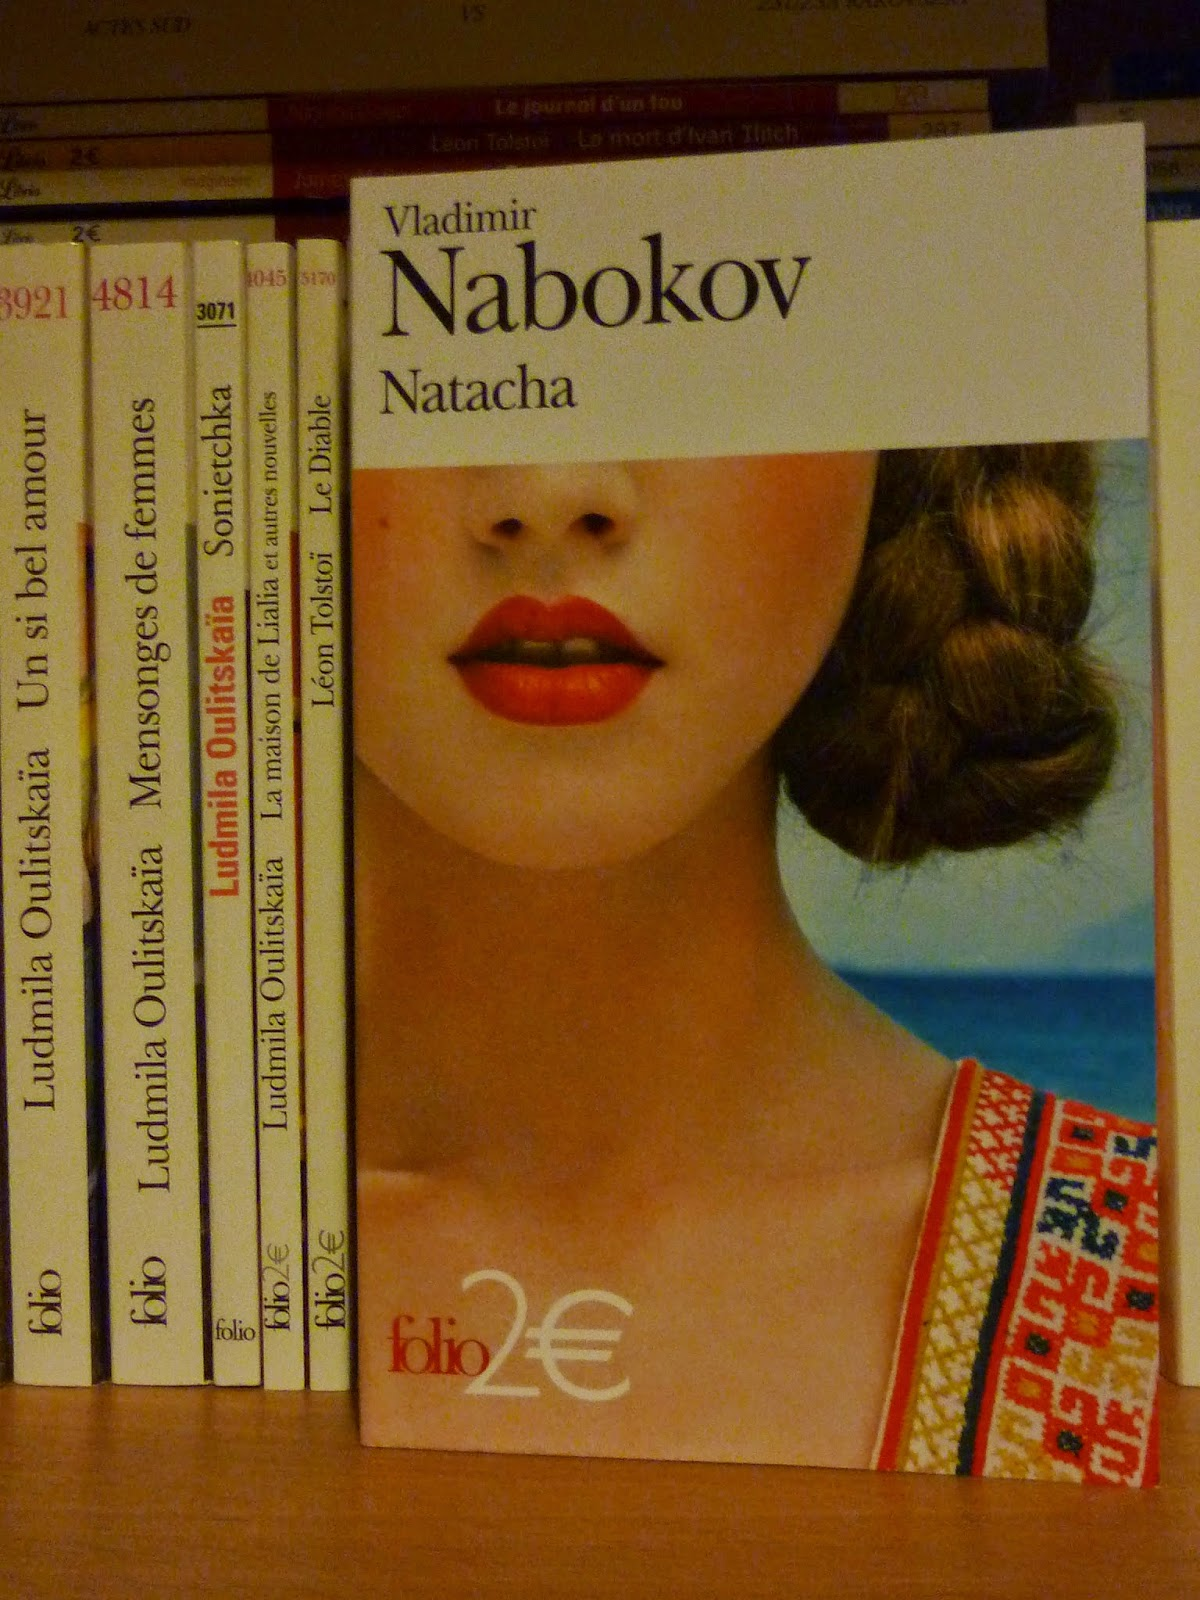 Natacha et autres nouvelles - Nabokov